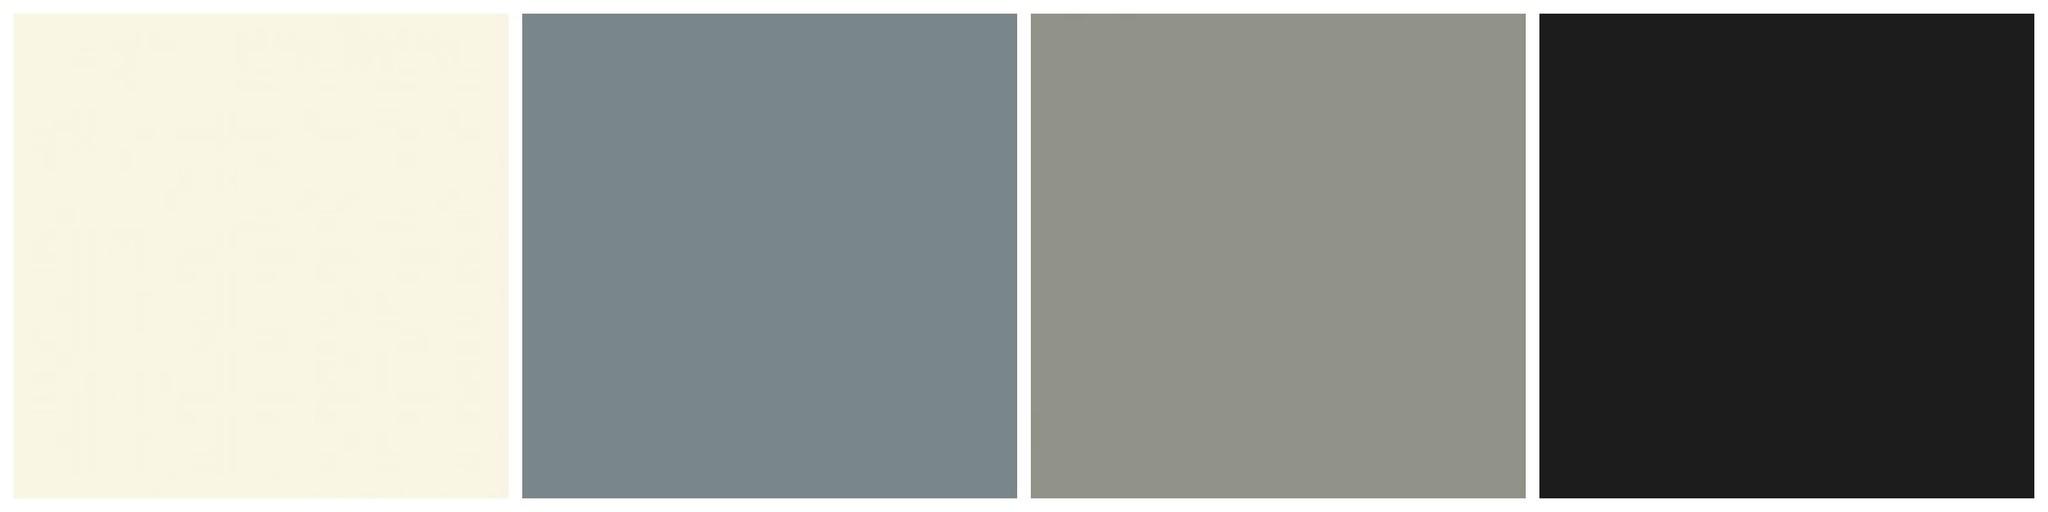 Badkamervloer kleuren